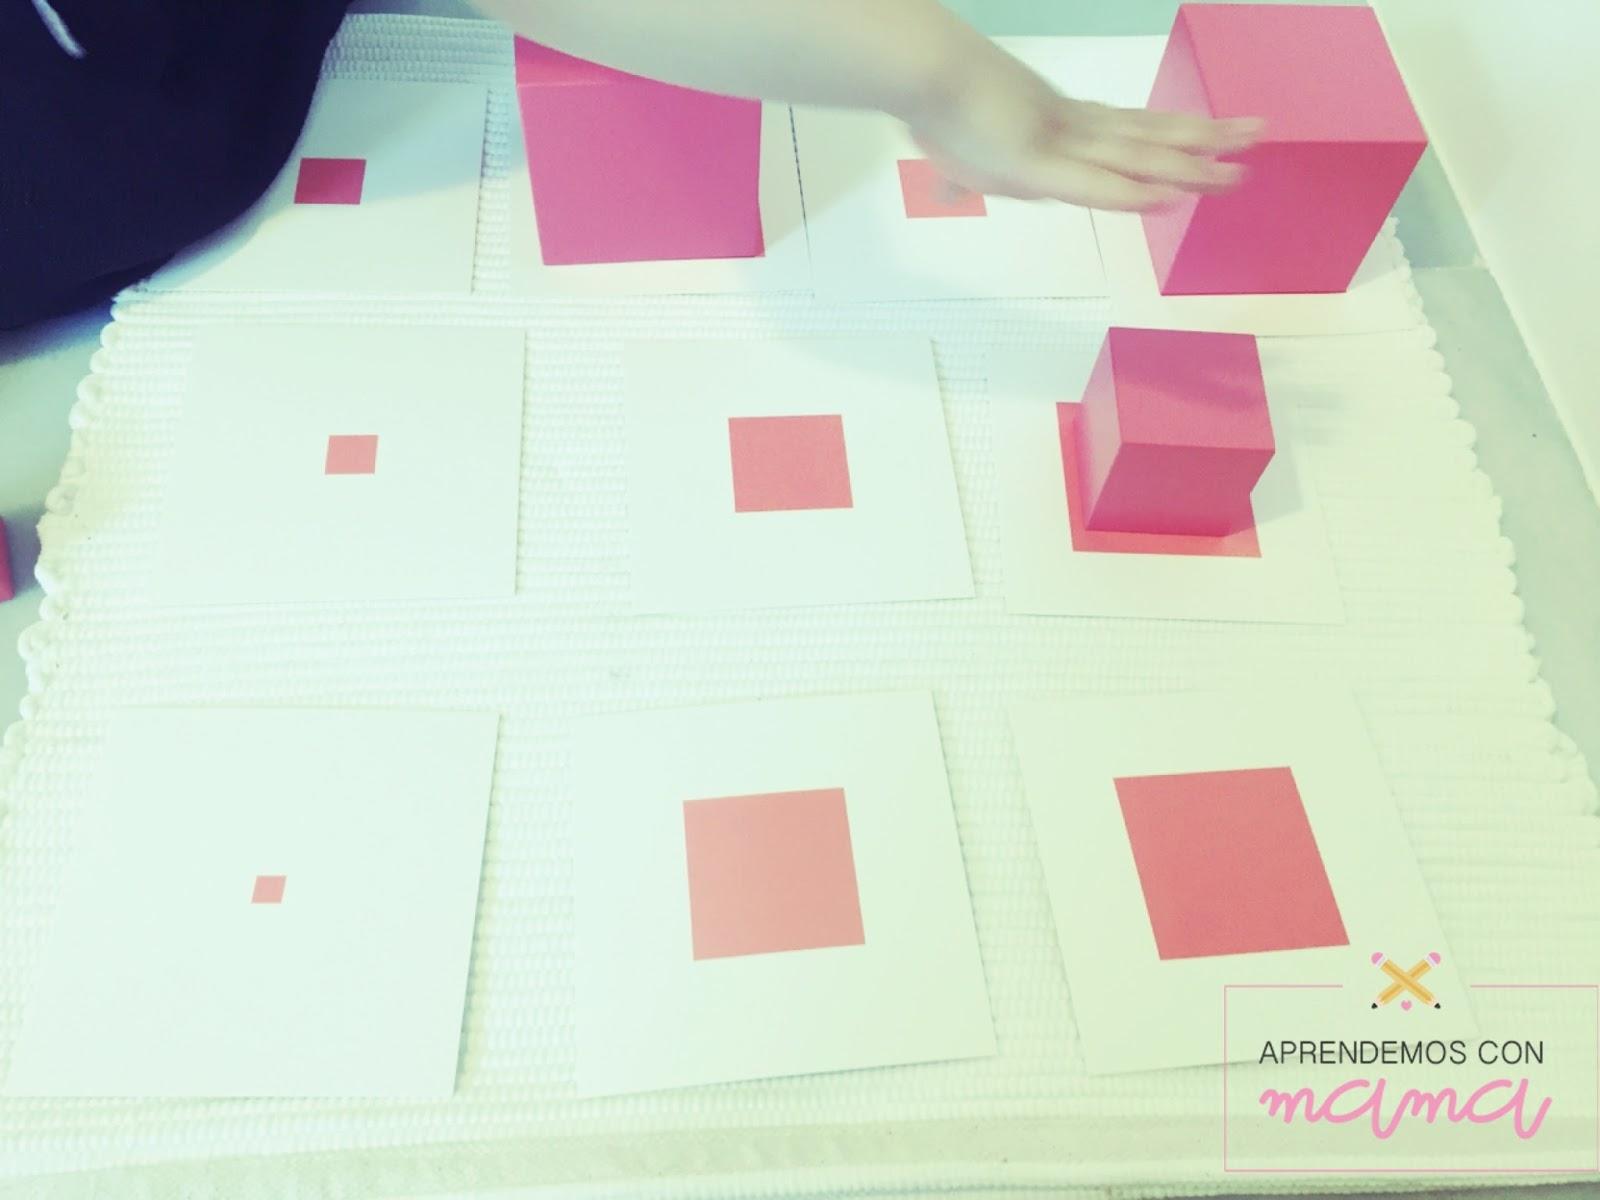 La torre rosa Montessori | Aprendemos con mamá